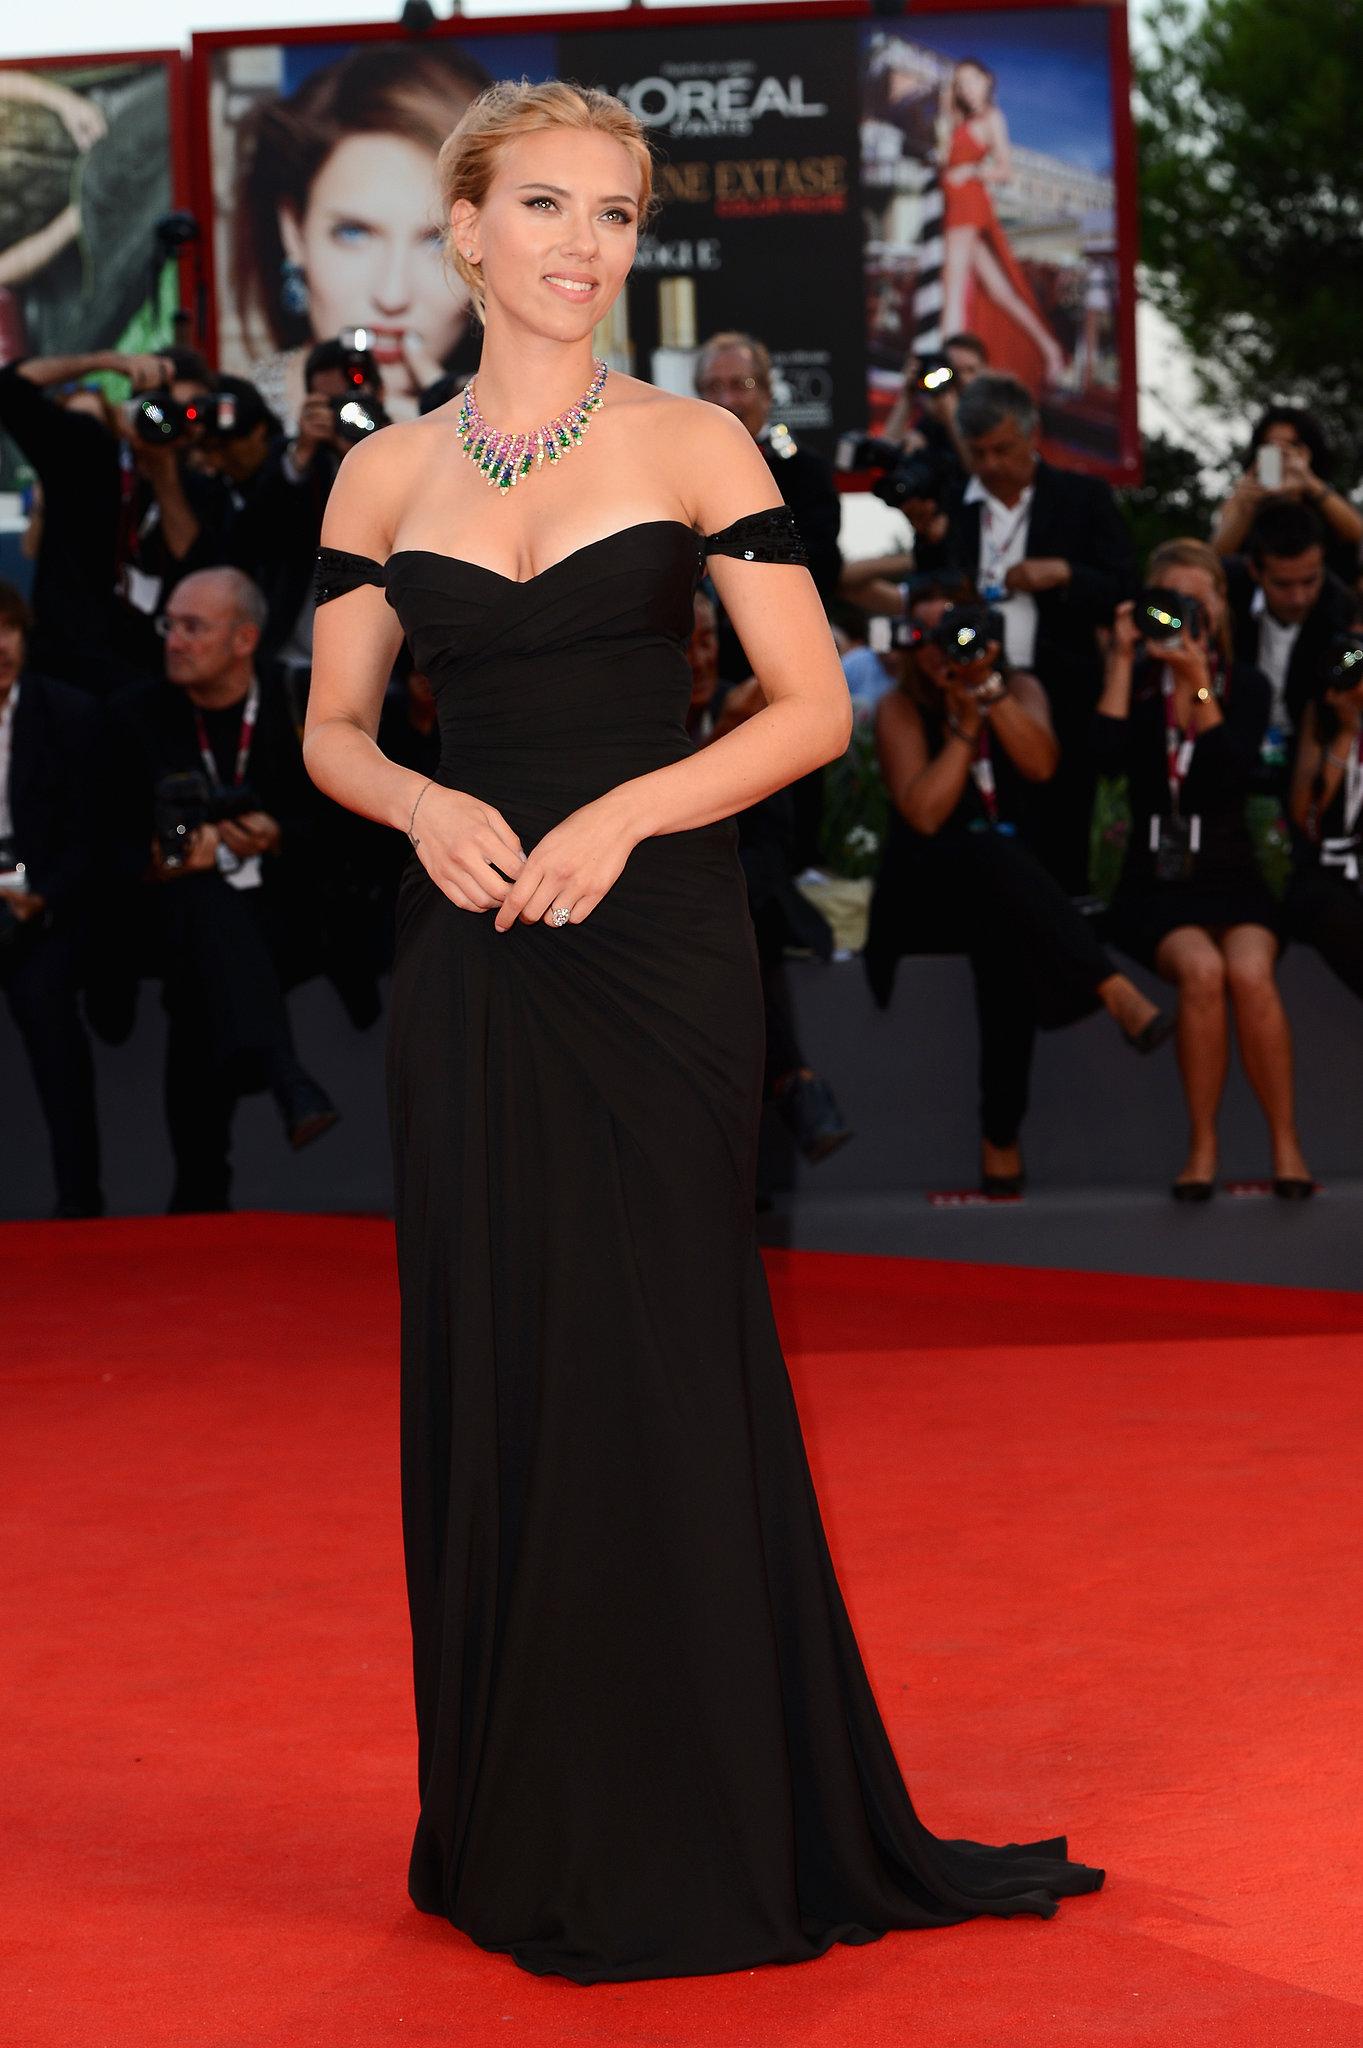 Scarlett Johansson at the Venice Film Festival, 2013